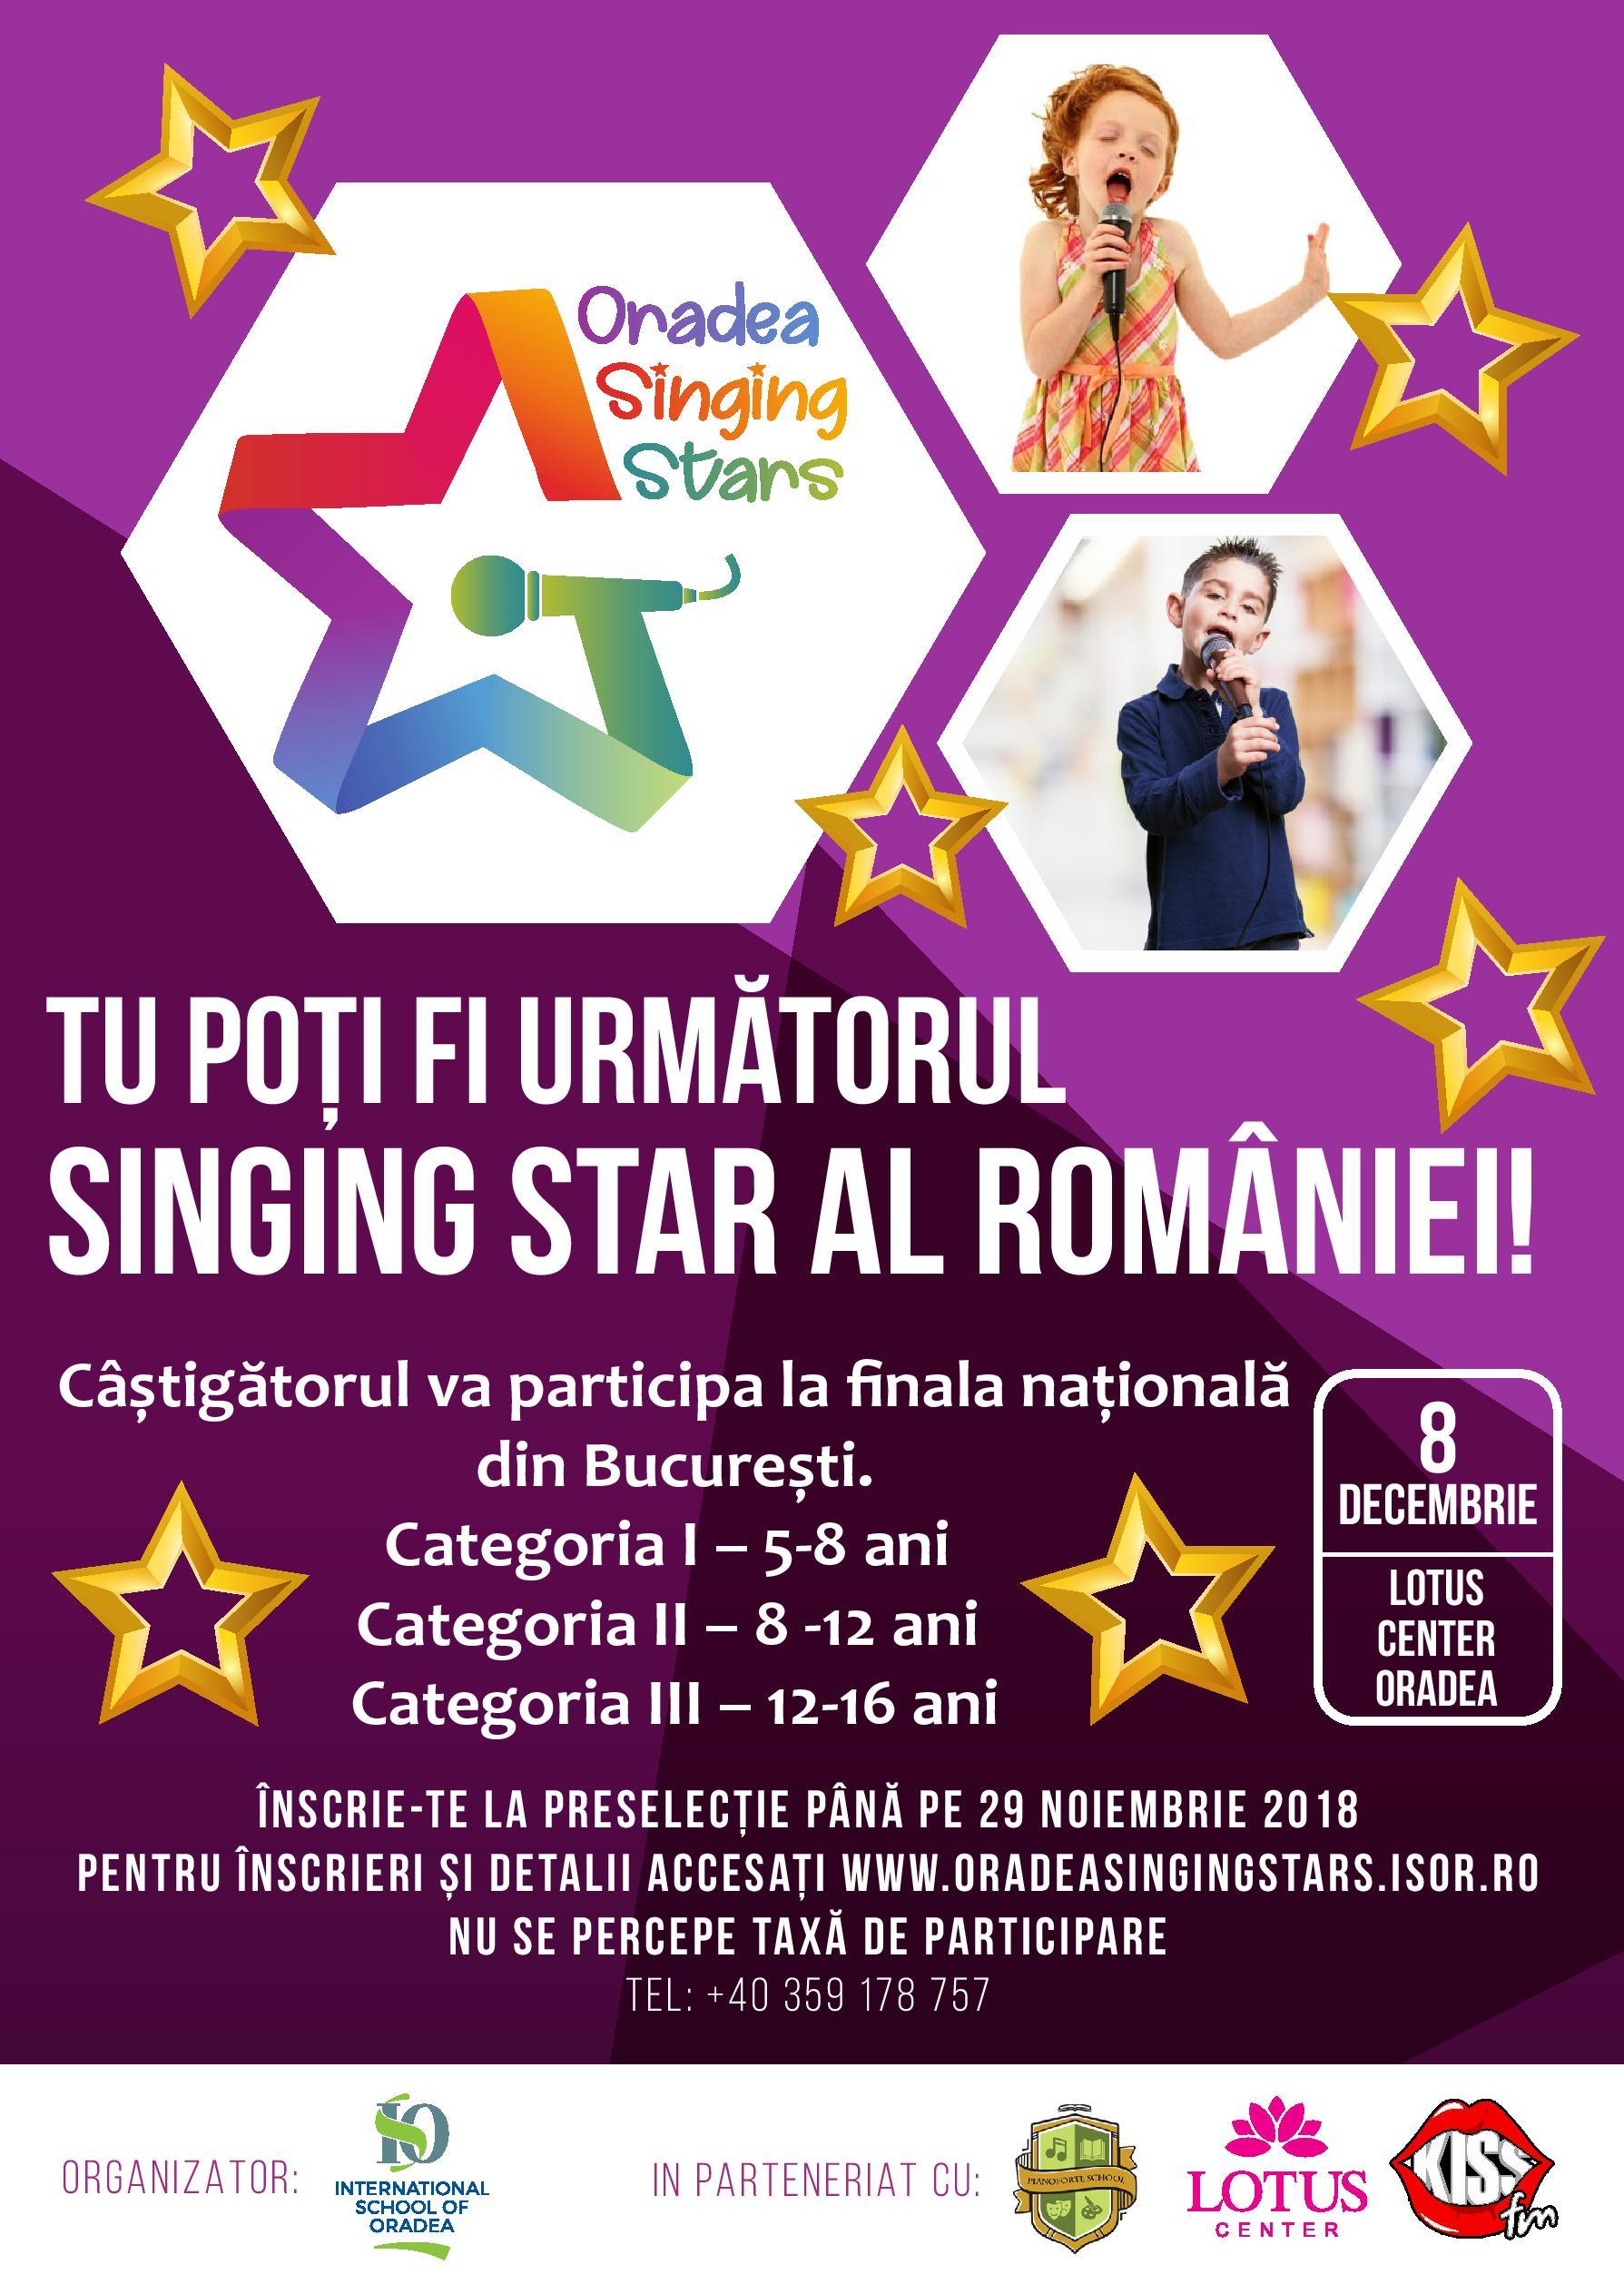 Oradea Singing Stars